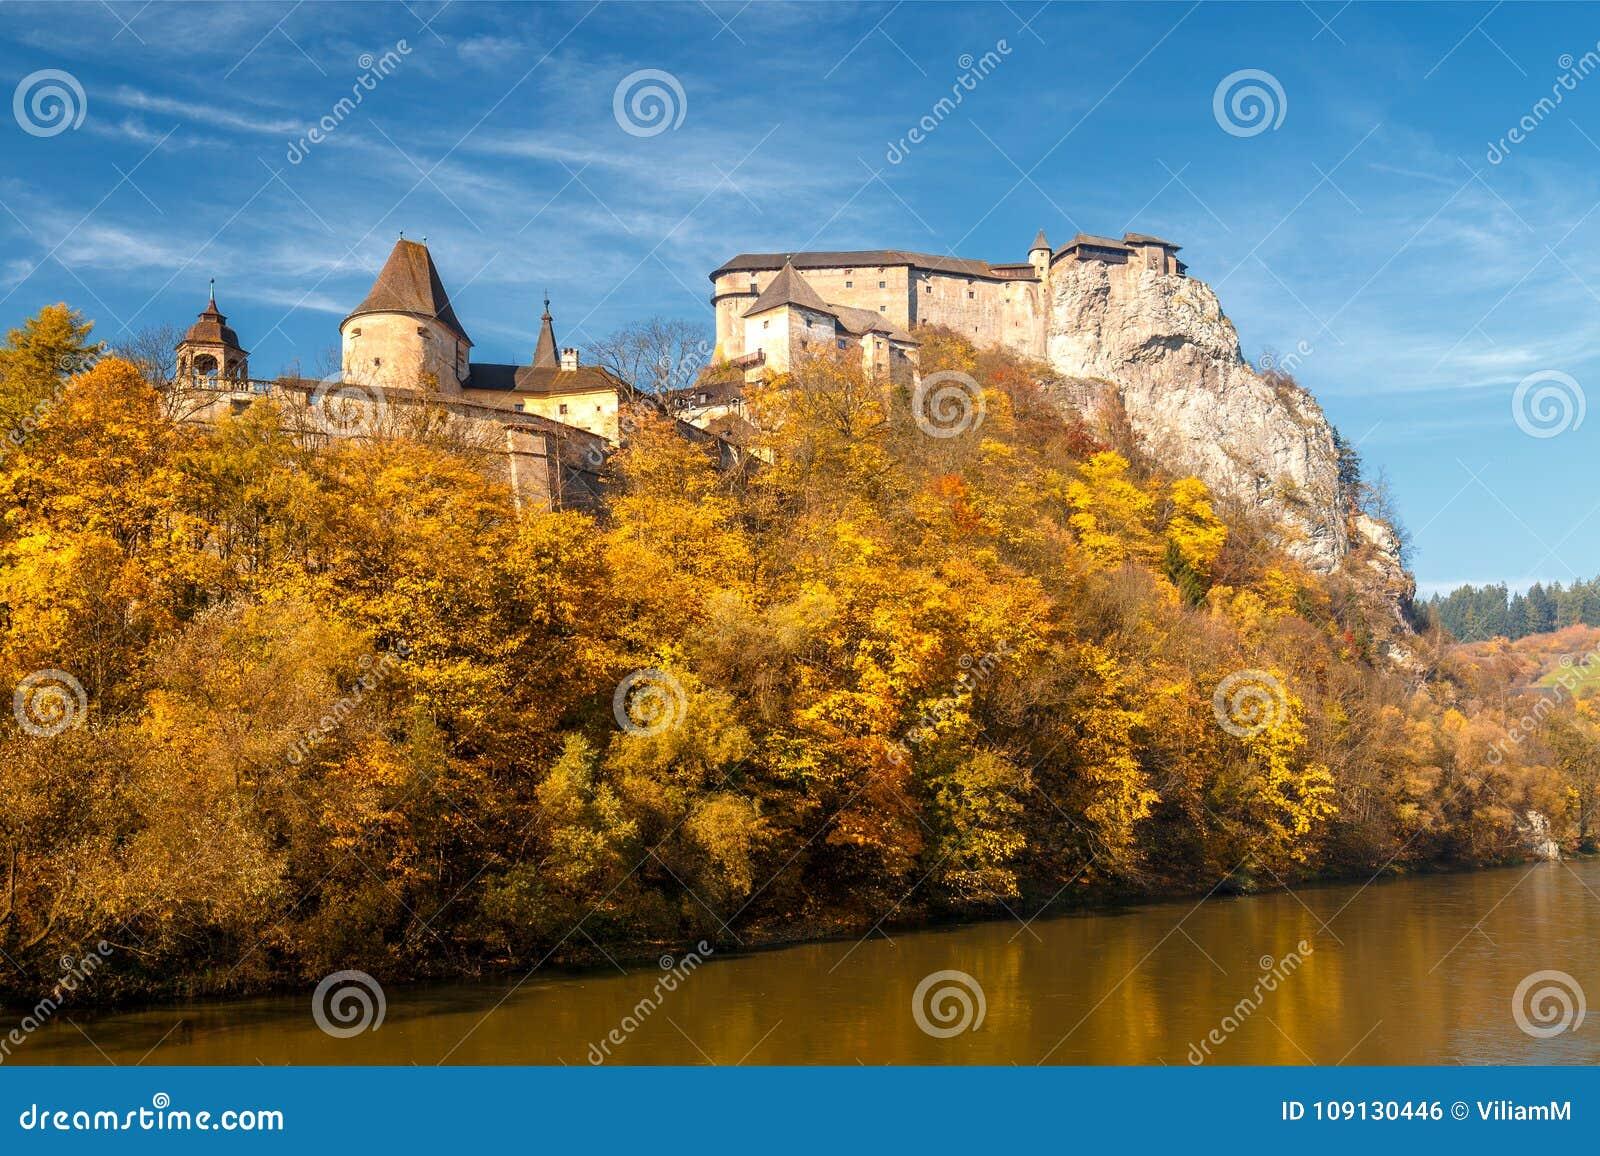 The medieval Orava Castle over a river.